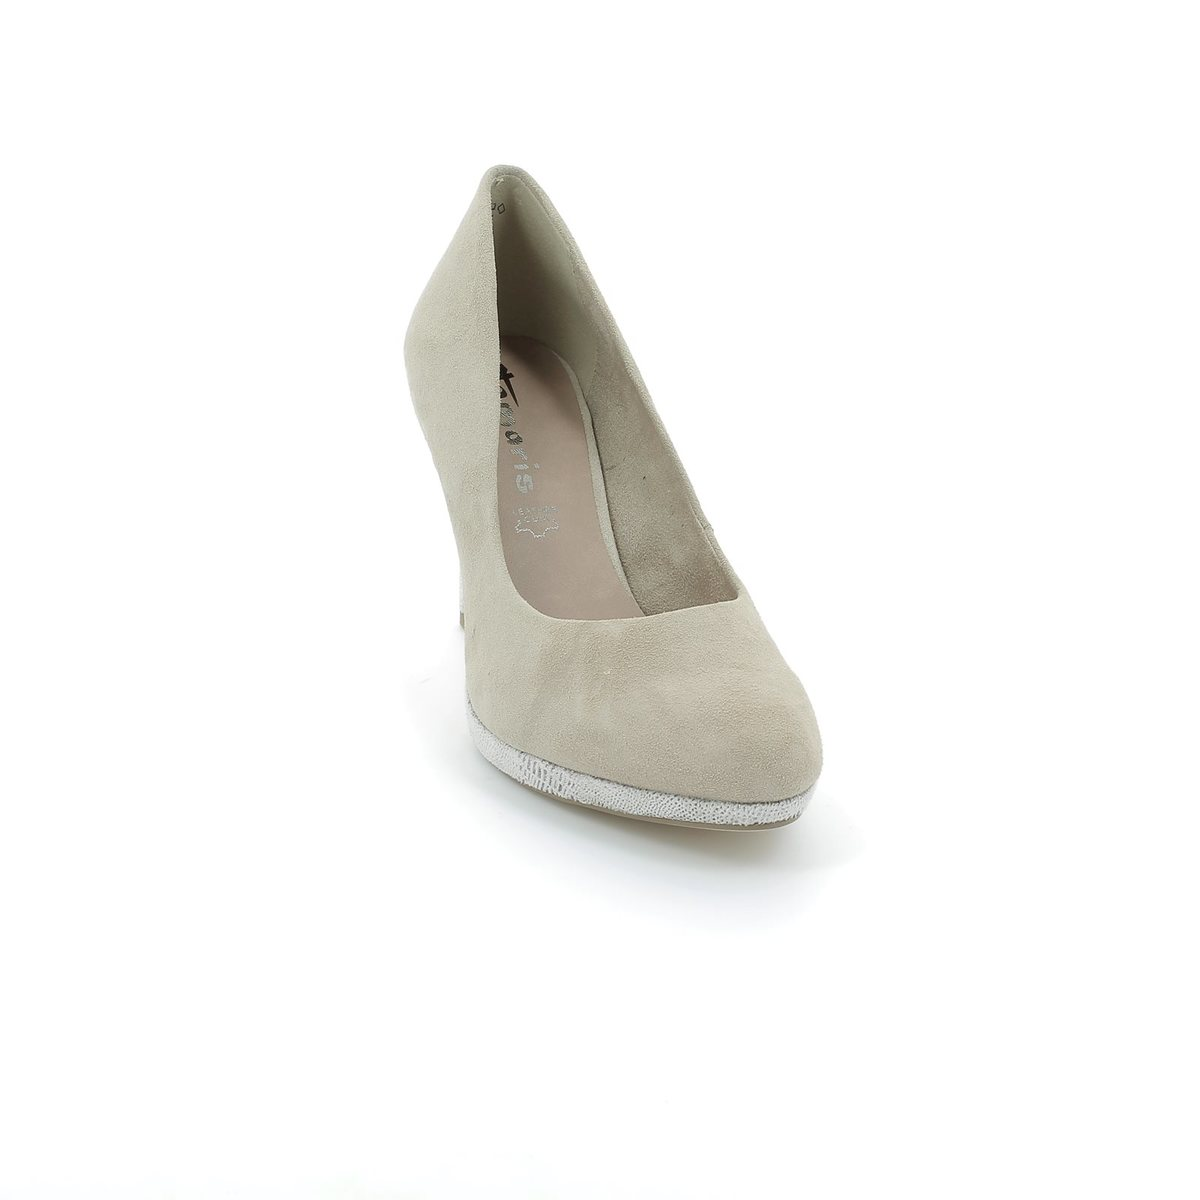 Tamaris Susie 22405 324 Beige suede high heeled shoes